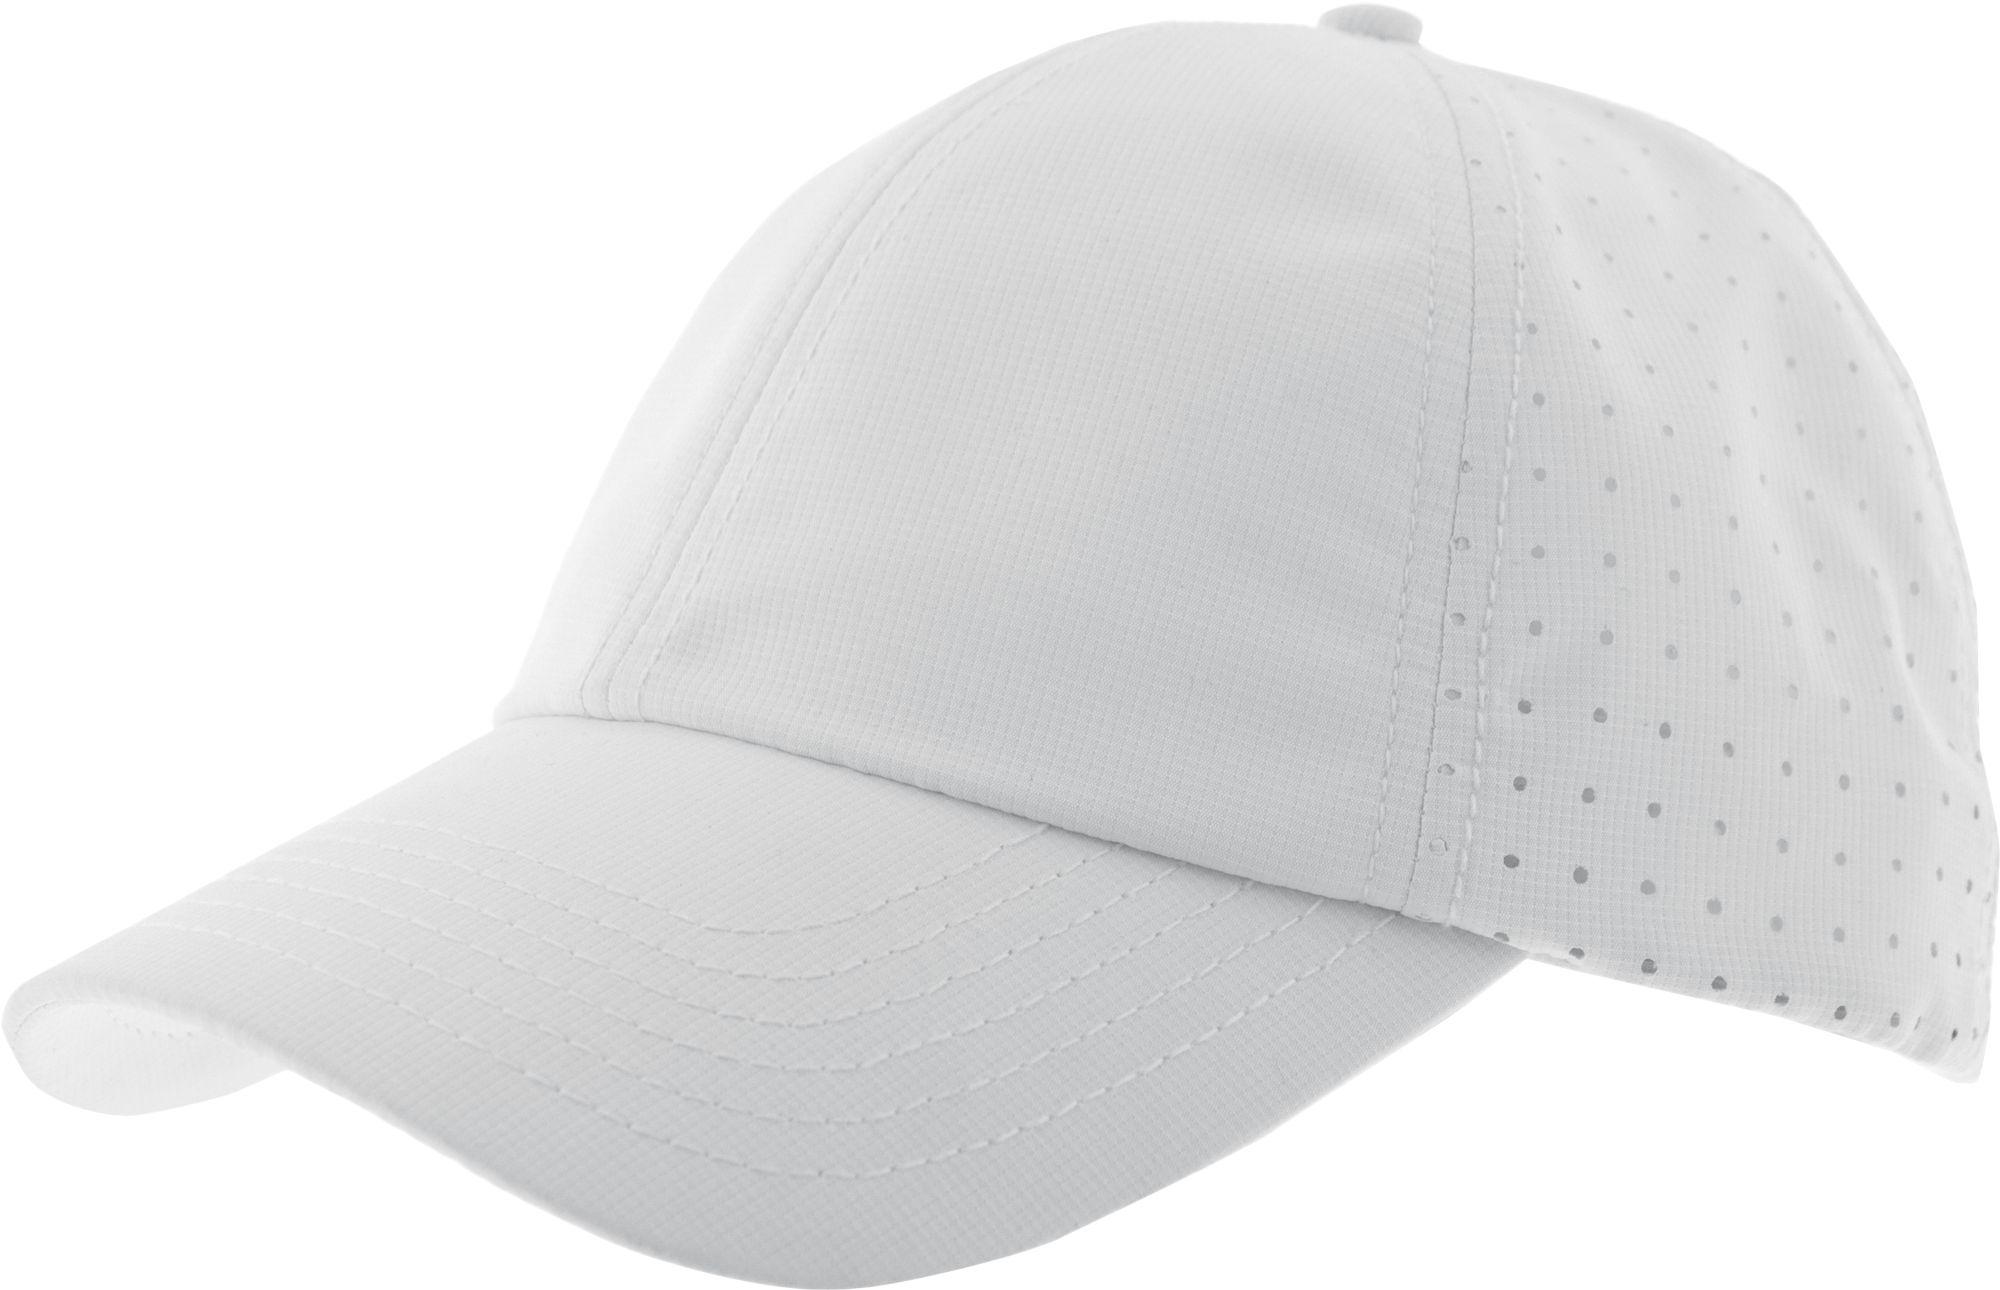 Slazenger Womens Tech Perforated Golf Hat DICKS Sporting Goods